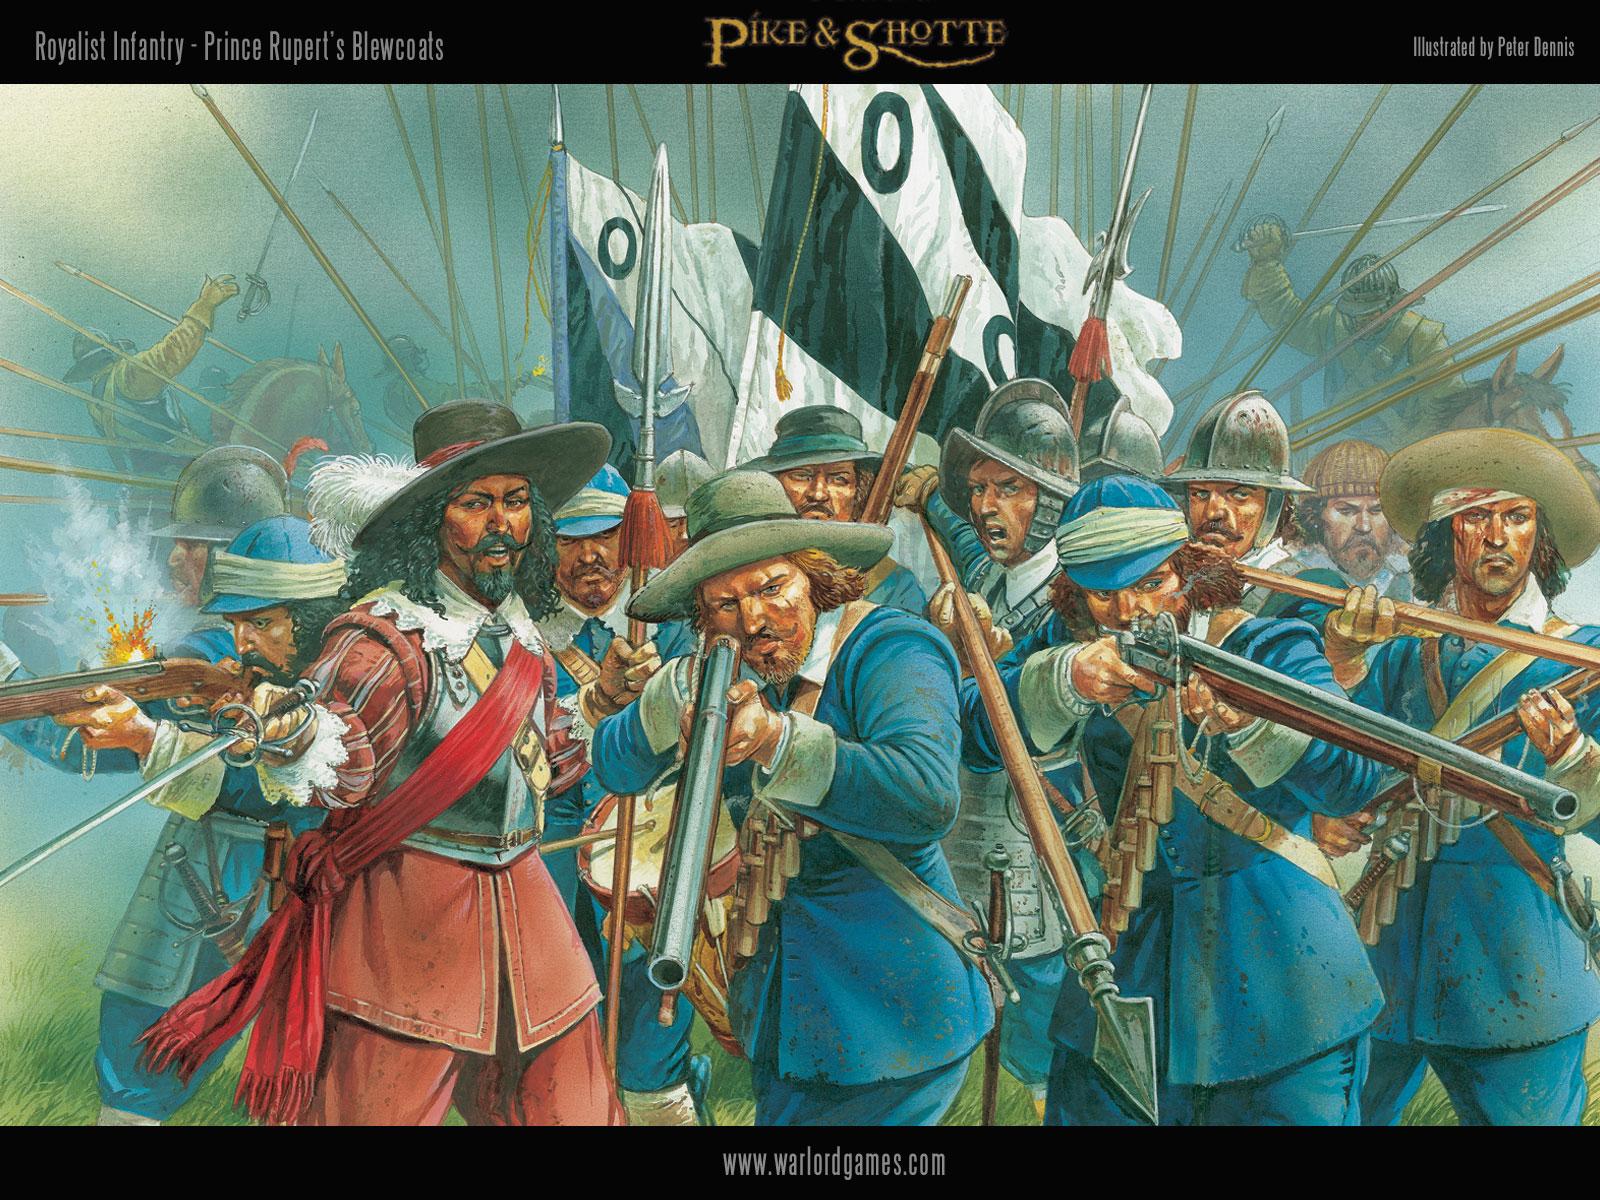 Illustrations P&S ECW-Royalist-Infantry-wallpaper